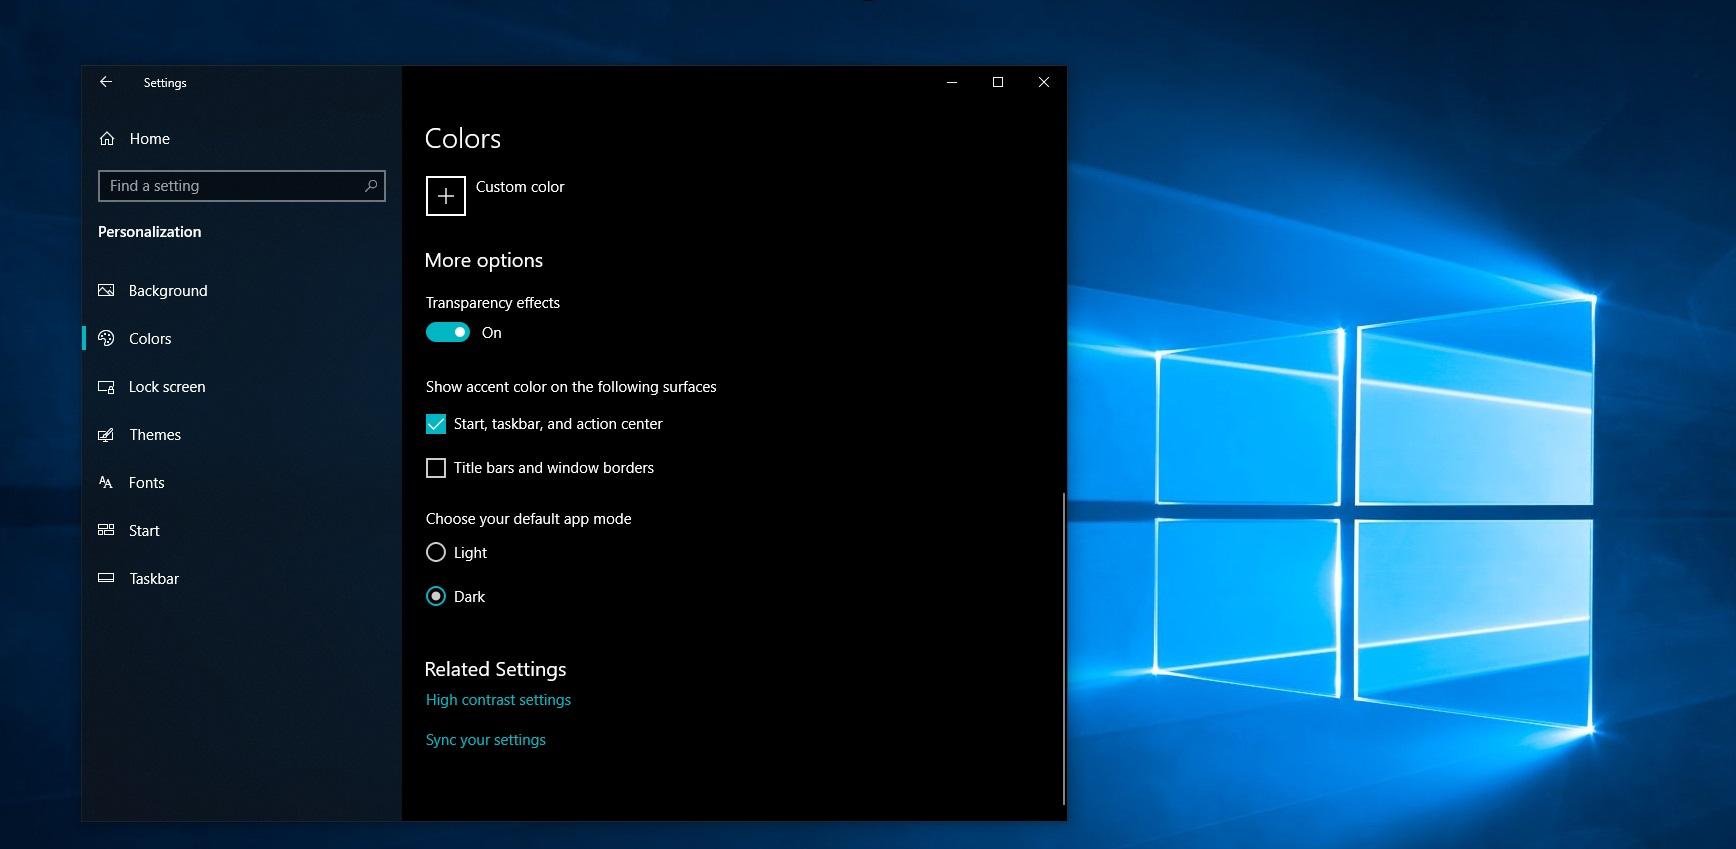 Windows 10 Tip: Dark theme in File Explorer | Windows